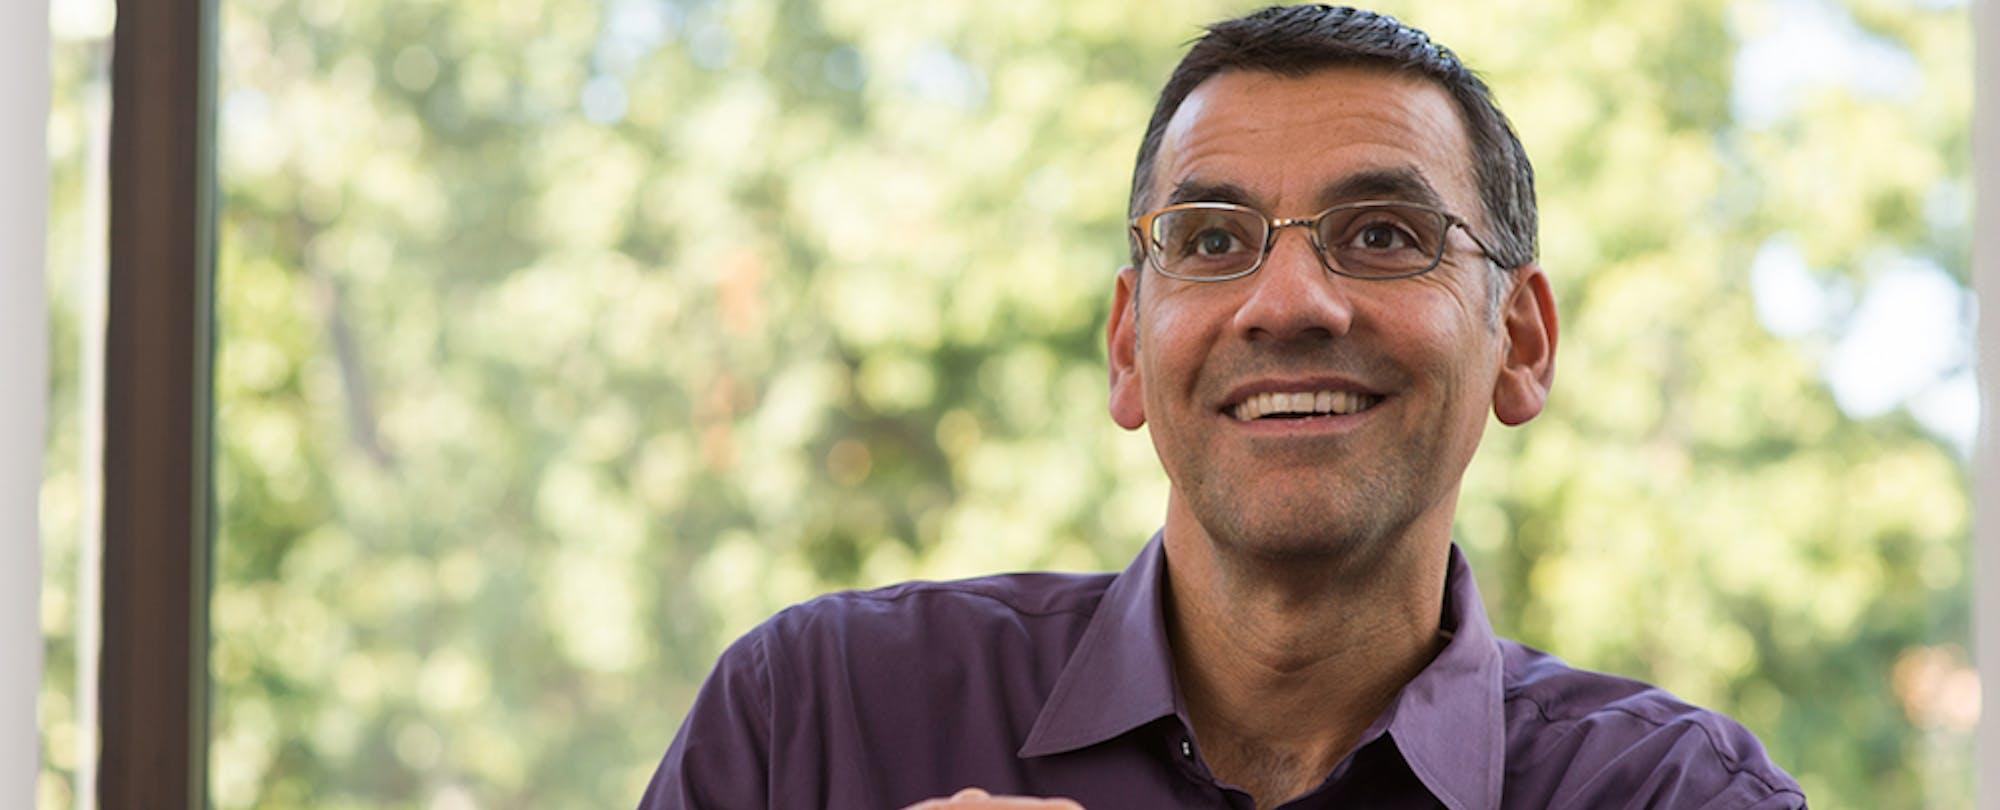 Blackboard Replaces CEO Jay Bhatt